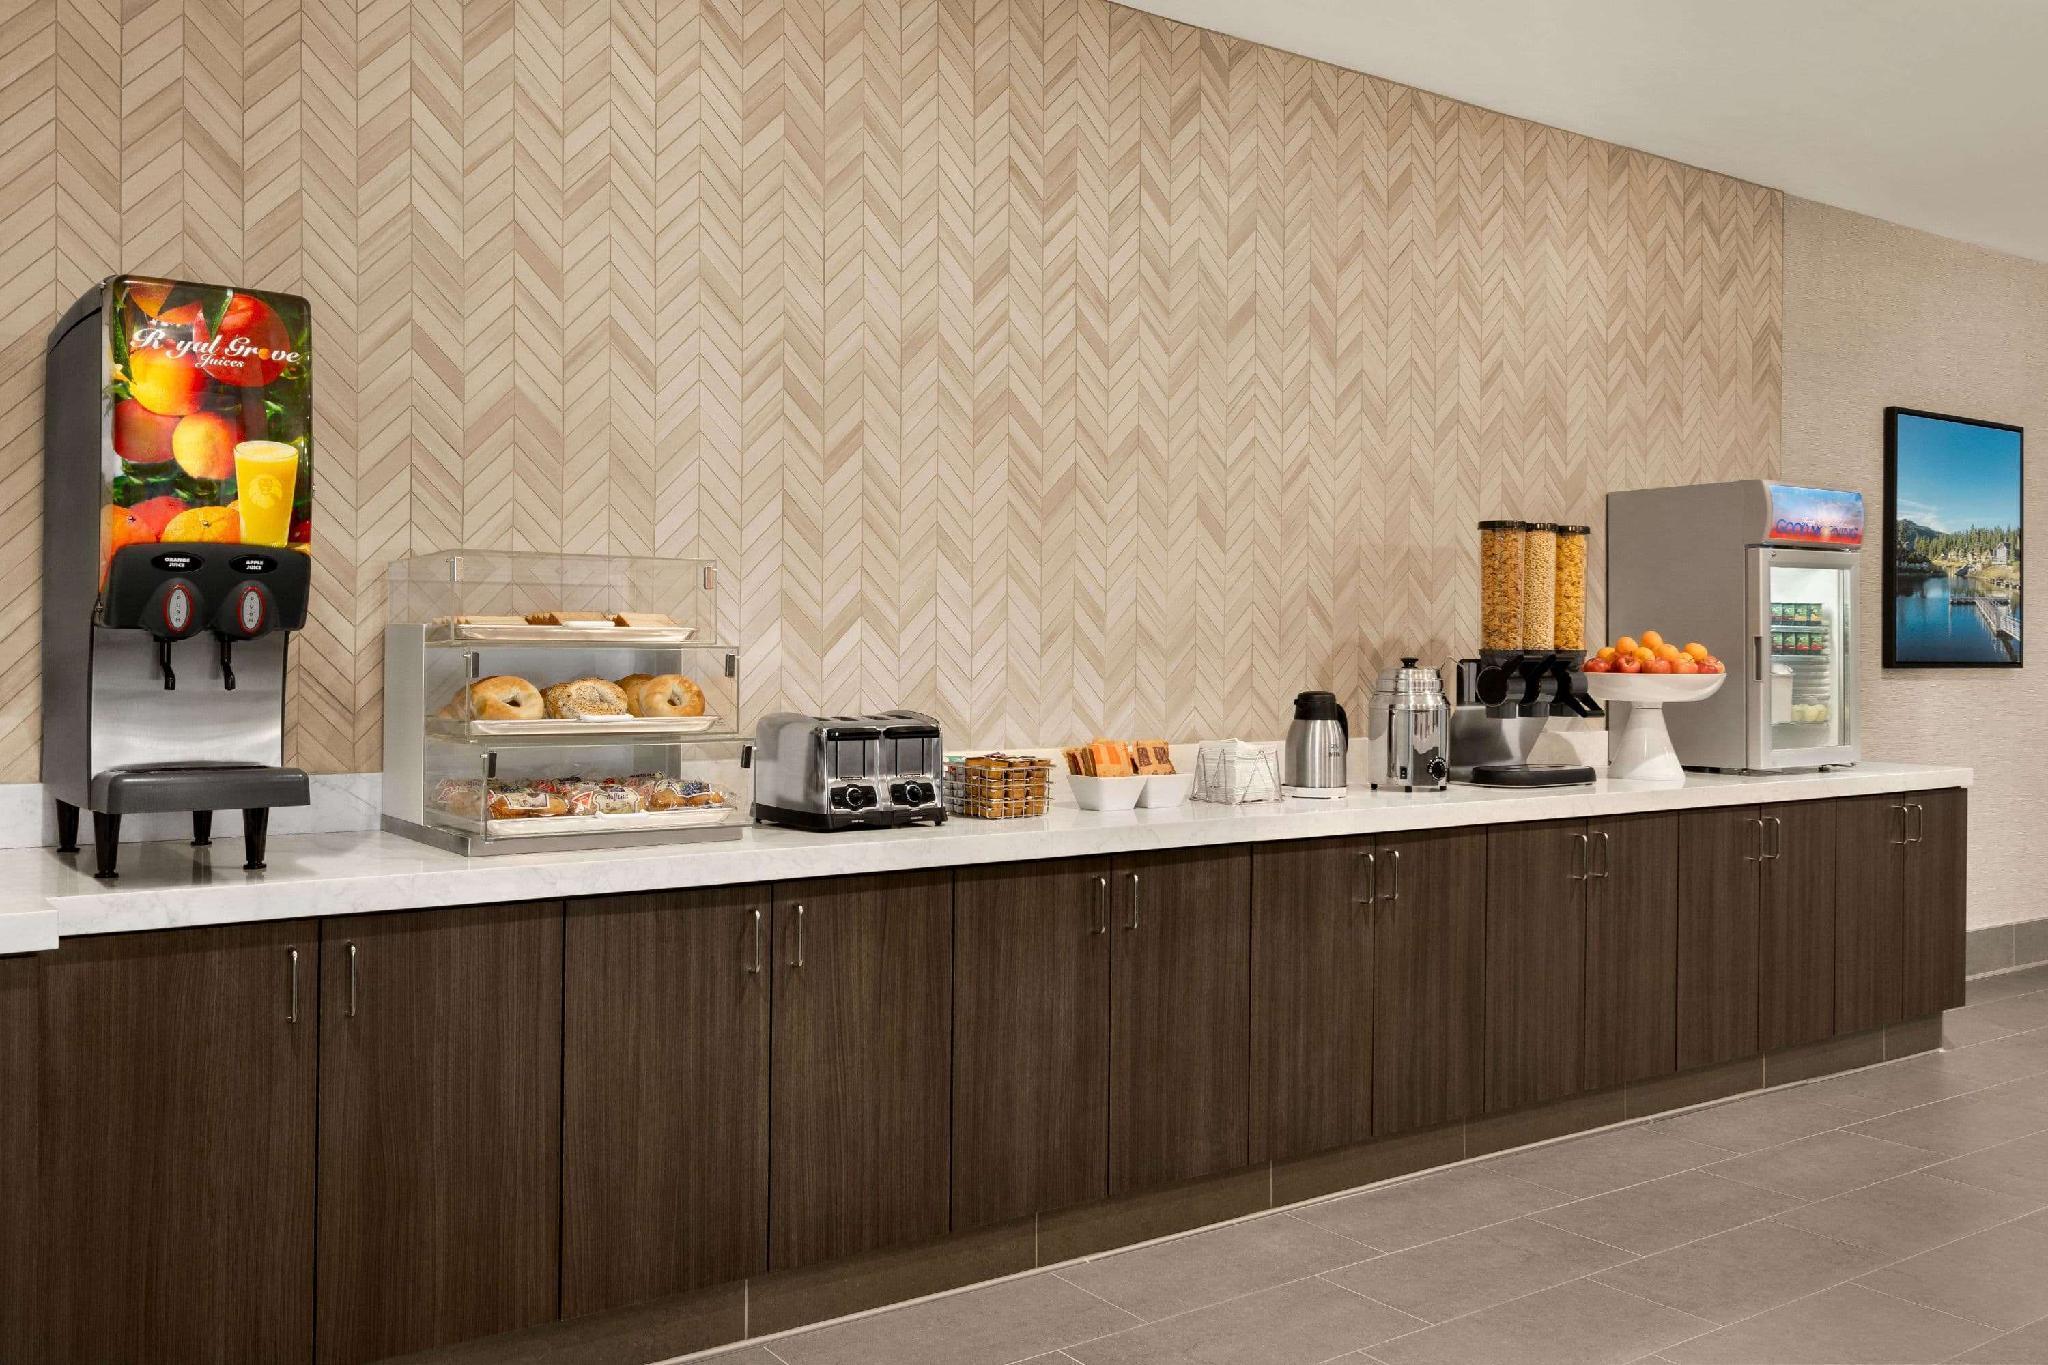 LaQuinta Inn And Suites By Wyndham San Bernardino